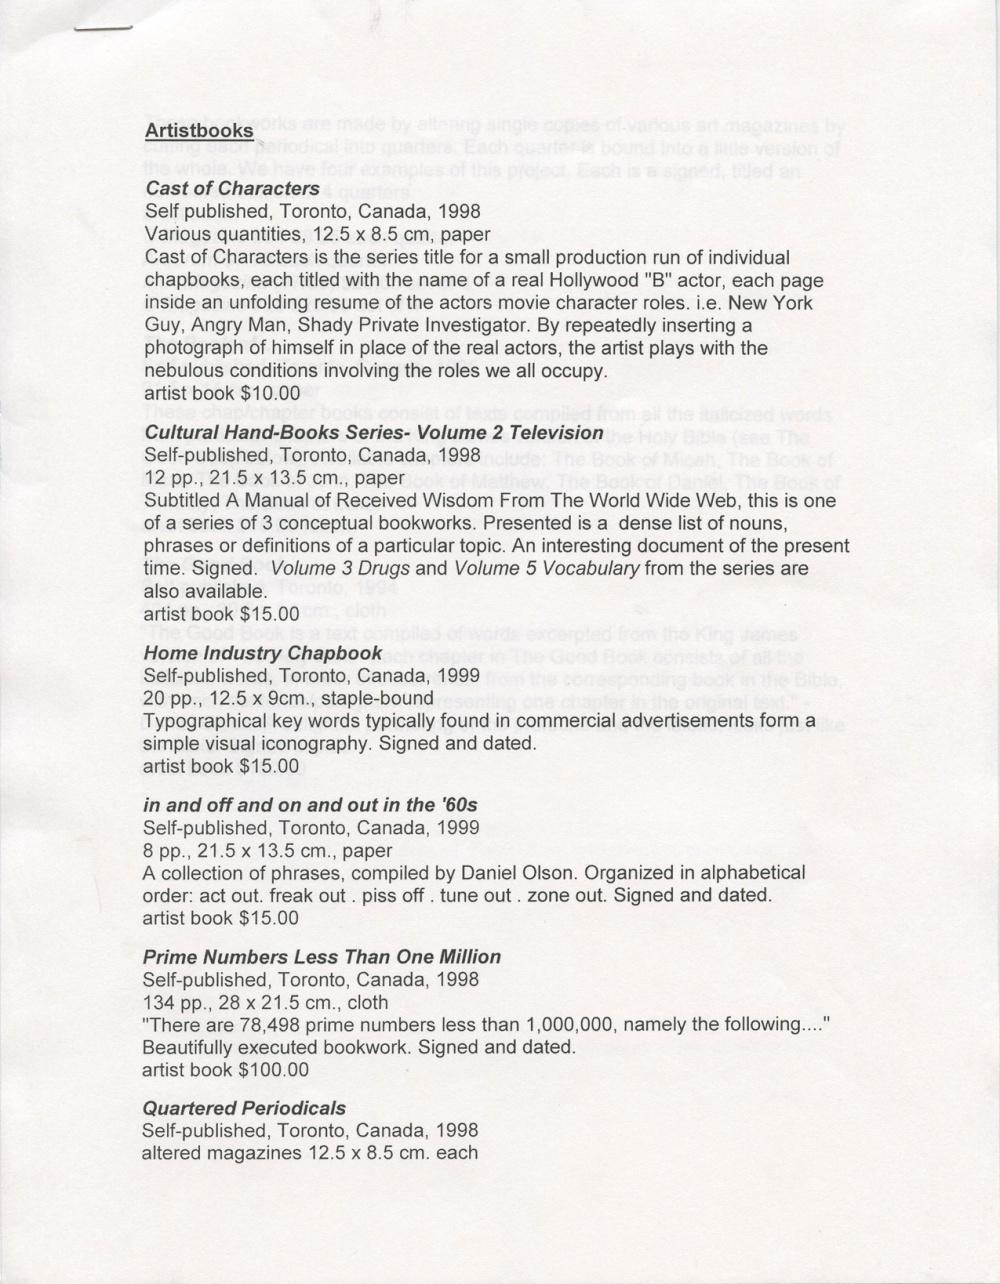 AMA0212.4, page 1